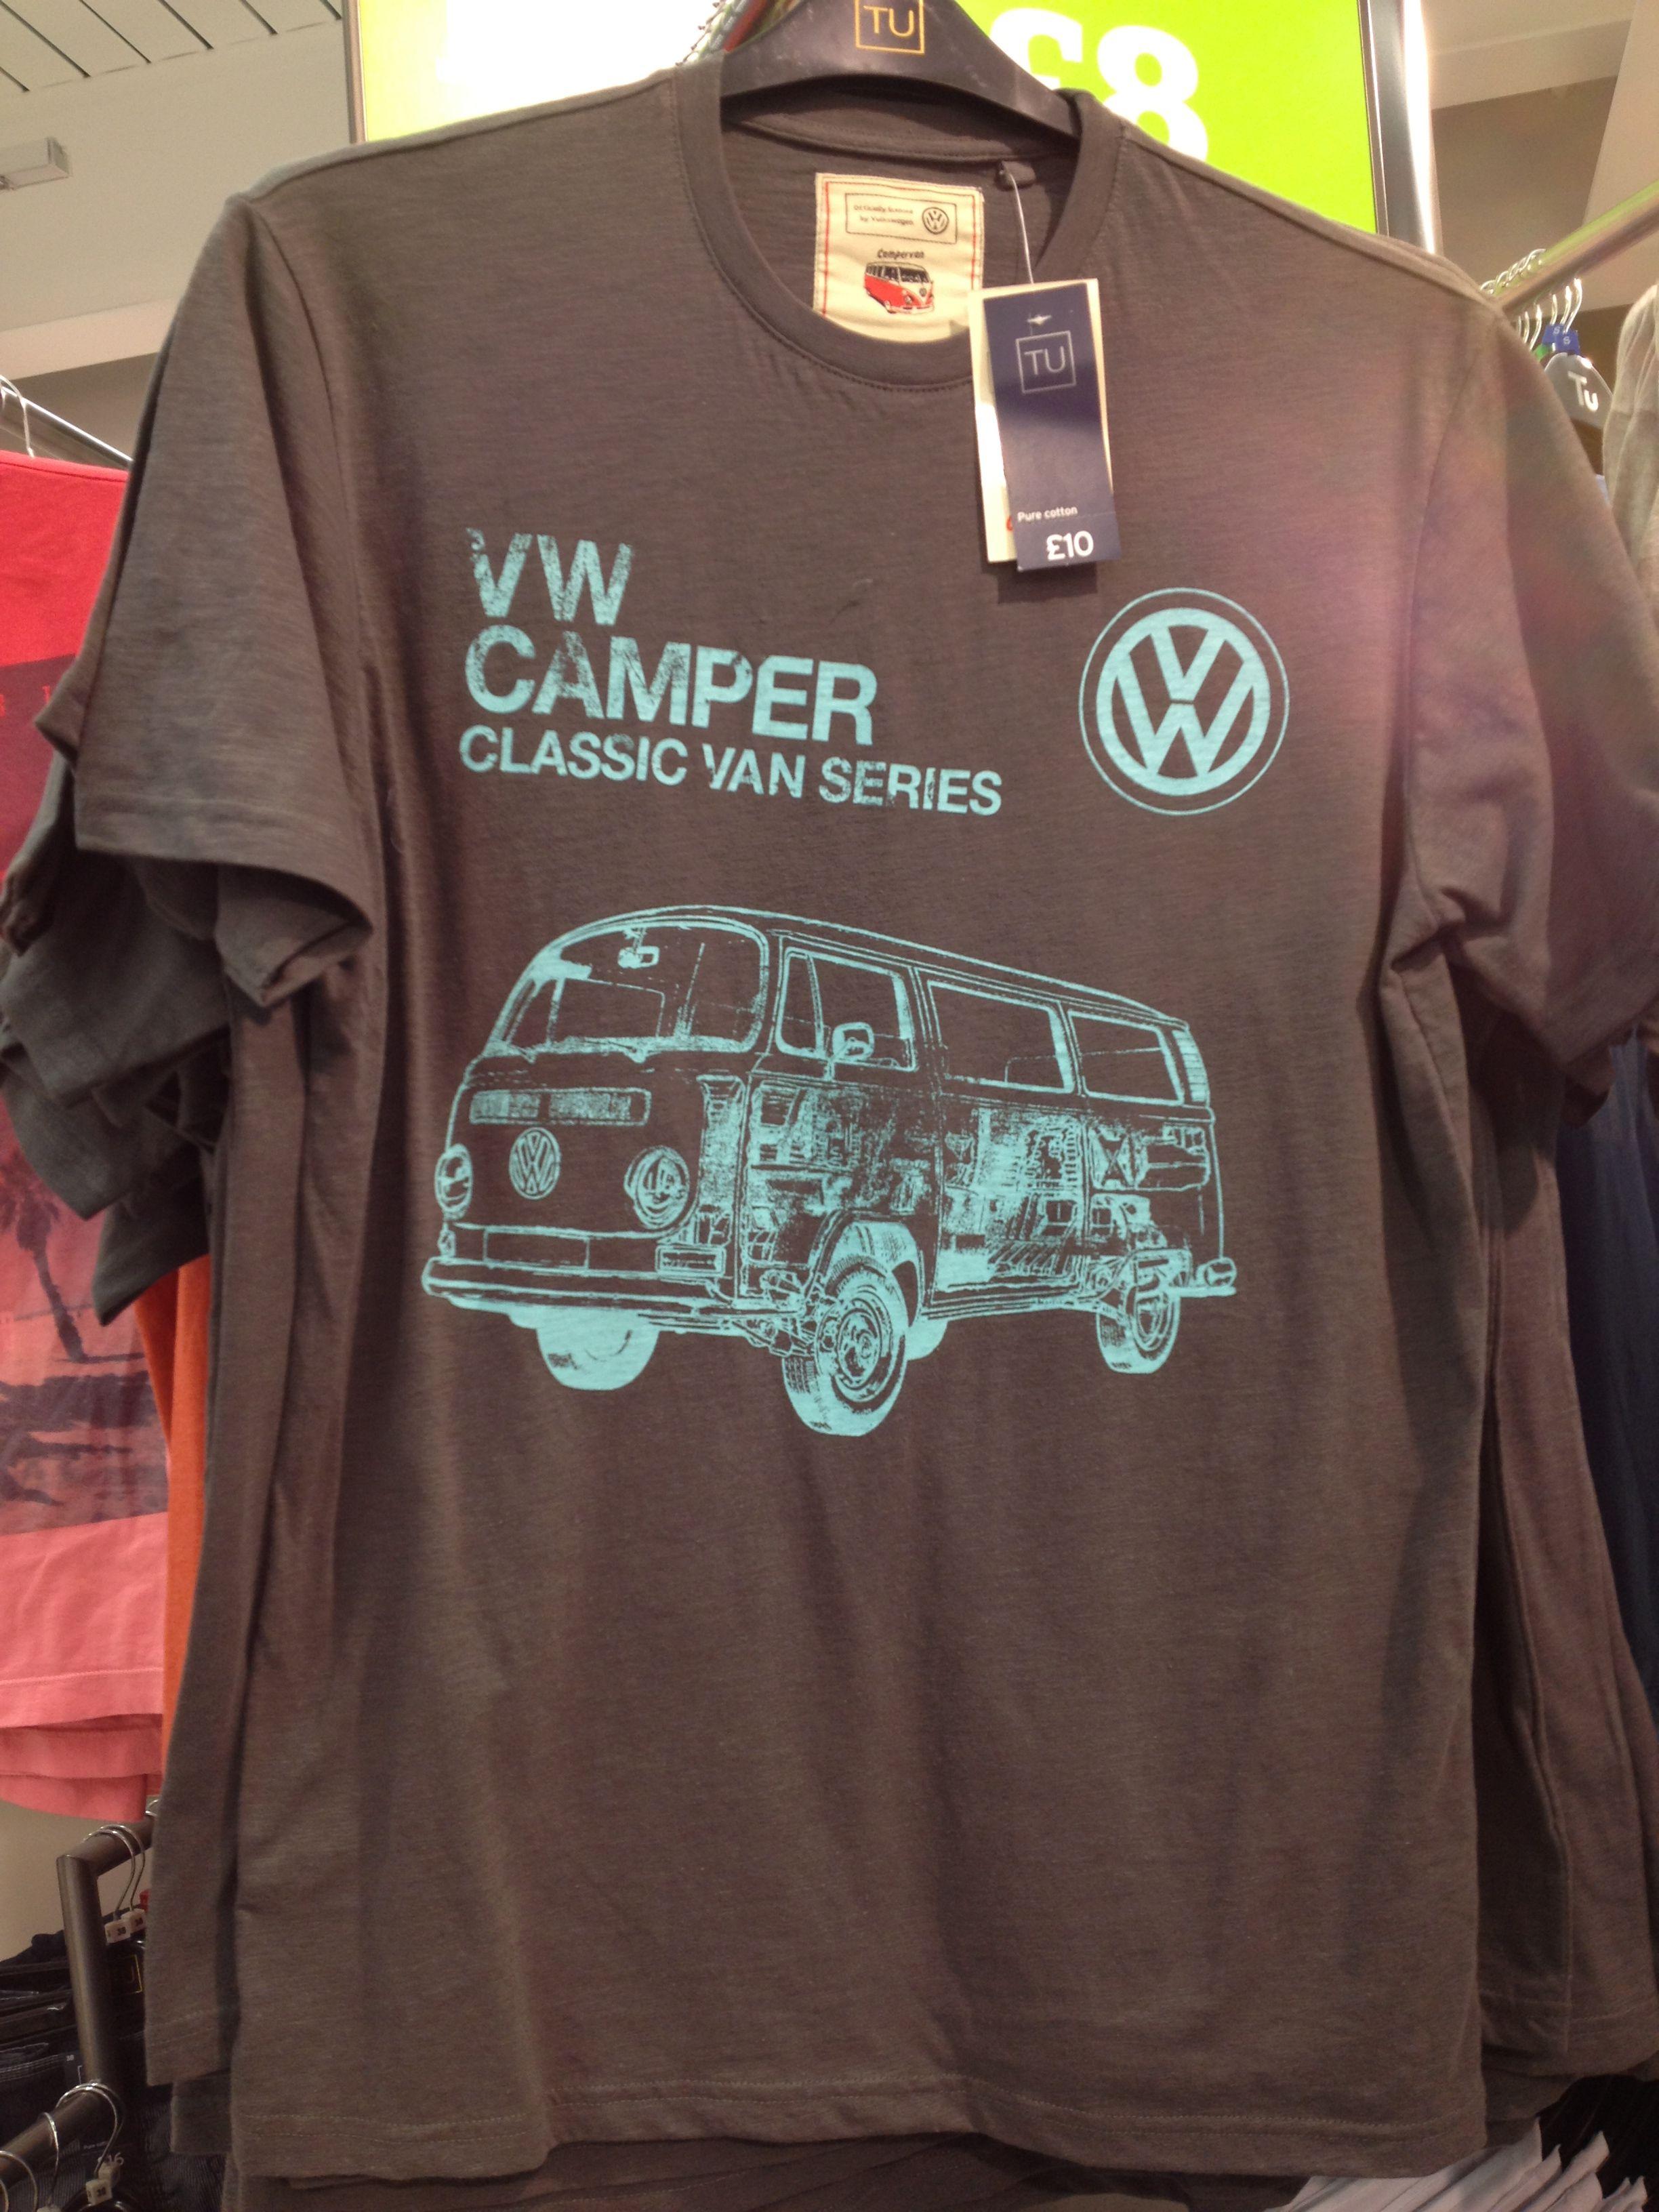 White apron sainsburys - Vw Campervan T Shirt At Sainsburys